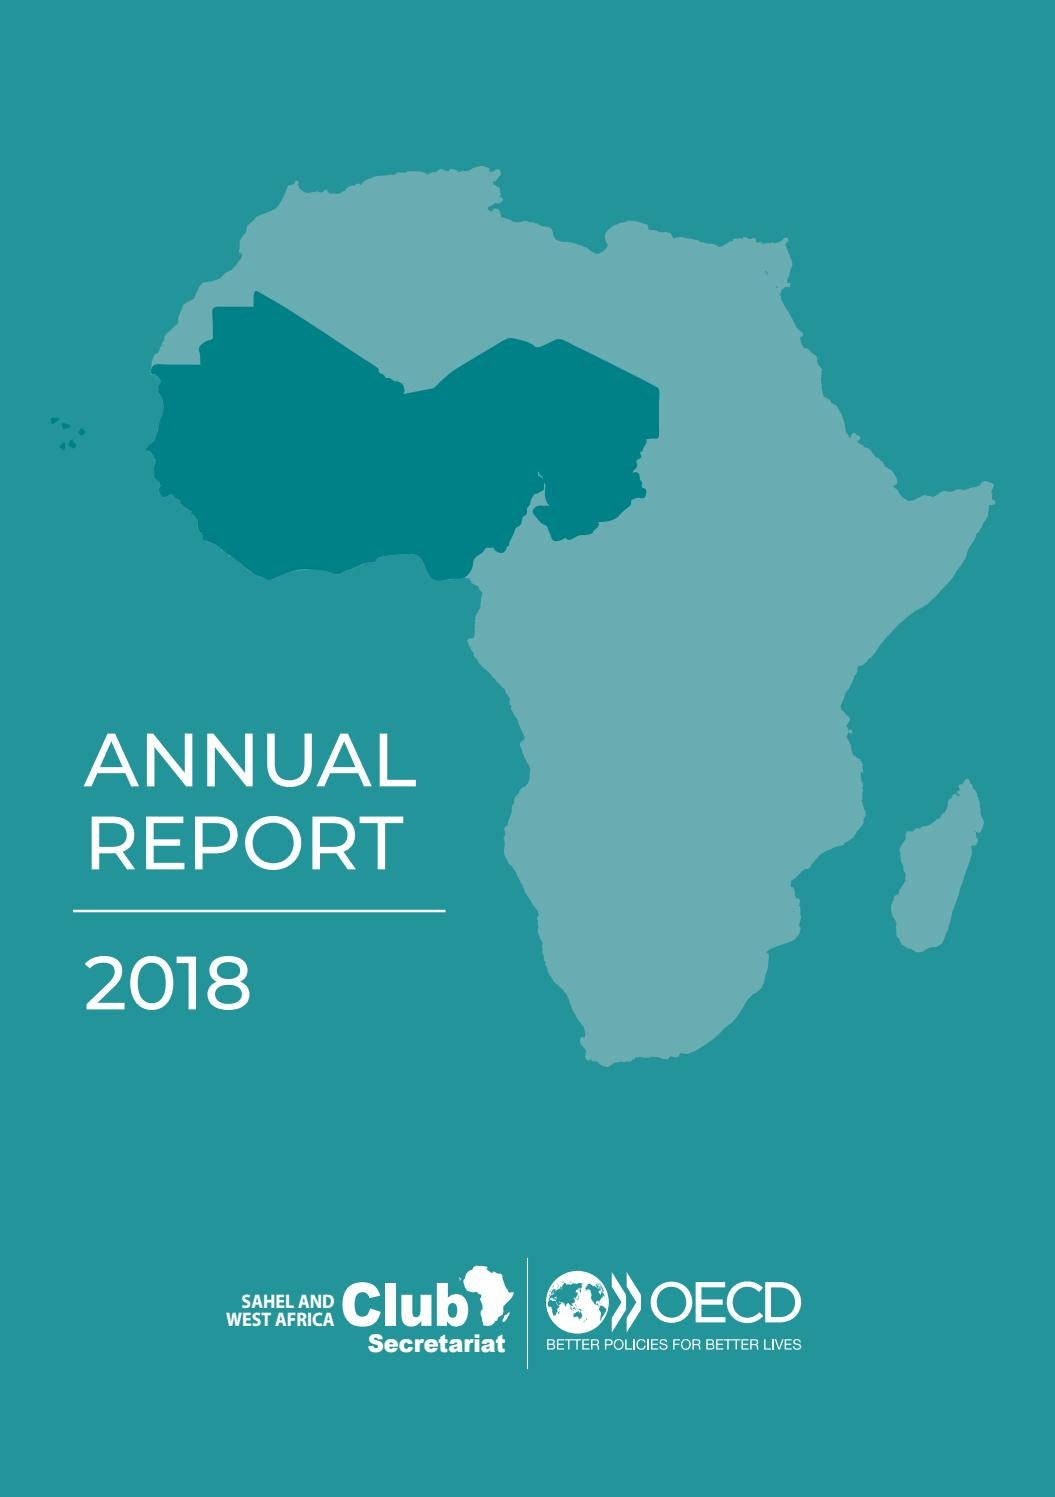 SWAC Annual Report 2018 by SWACOECD issuu